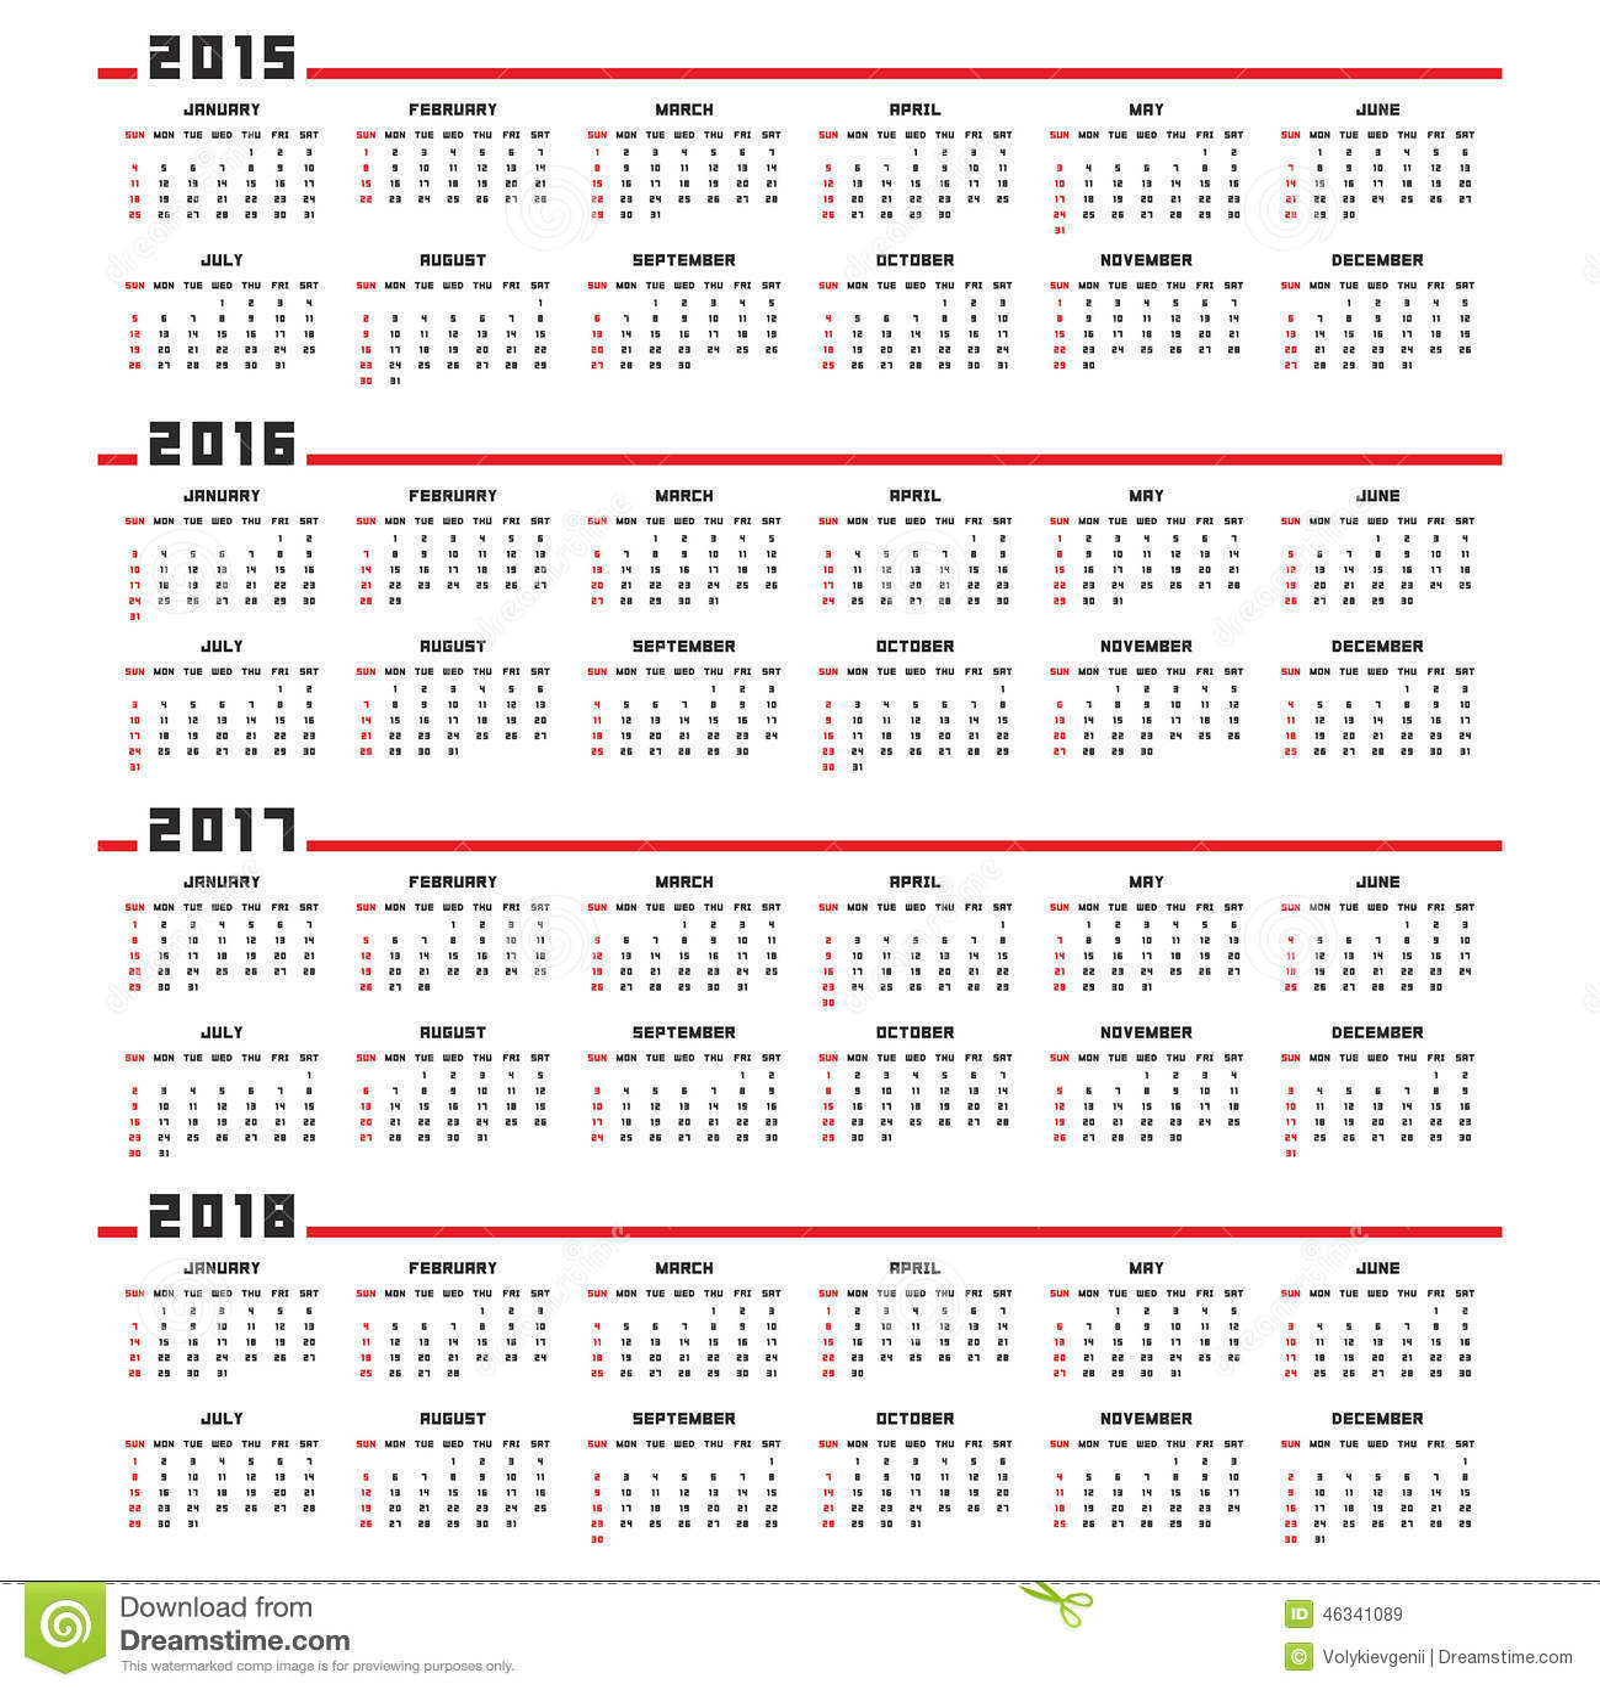 Kalender 2015, 2016, 2017, 2018